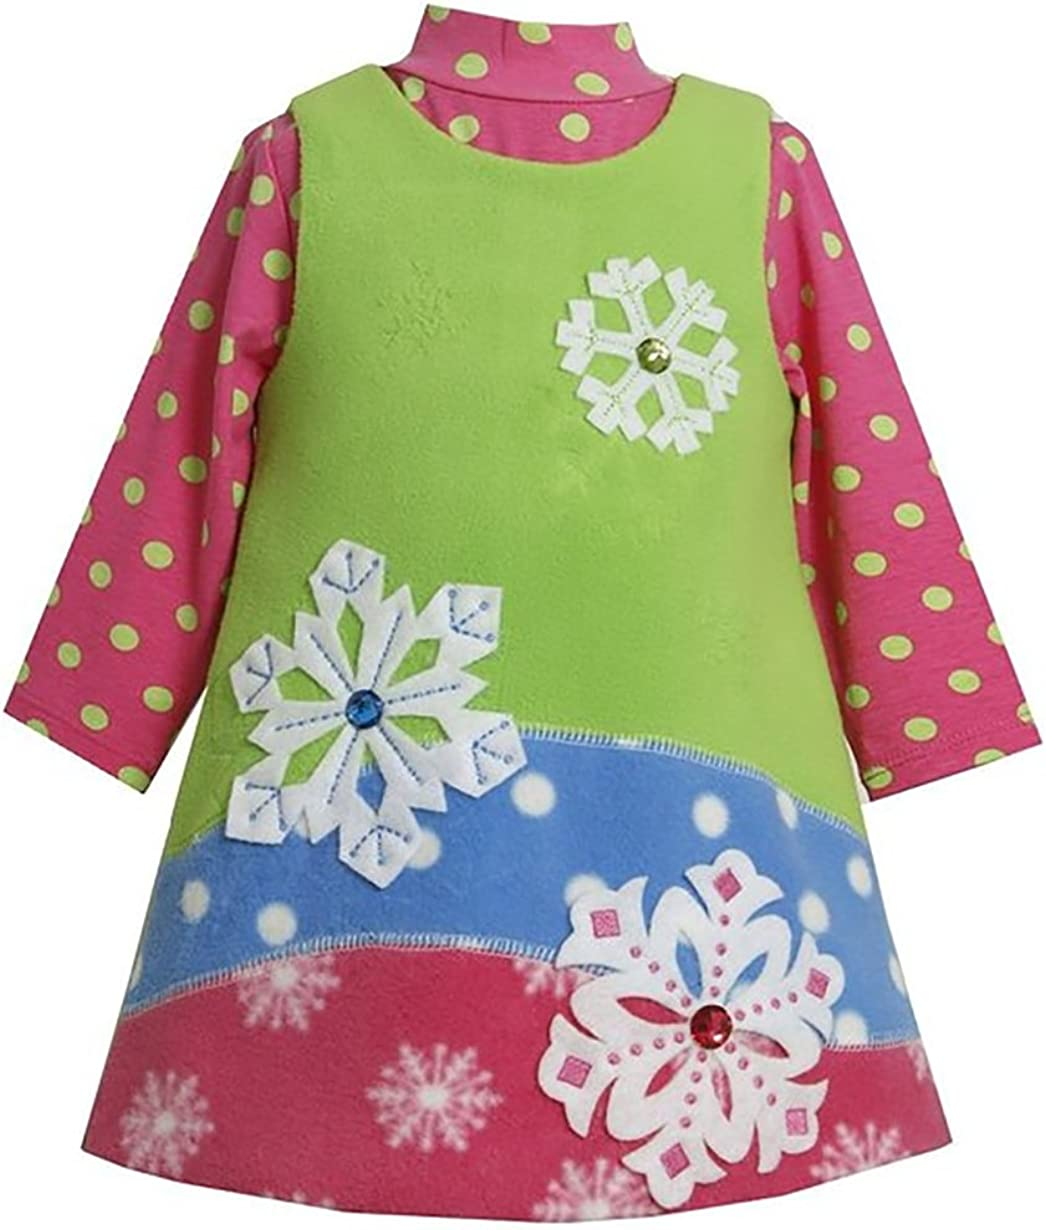 Bonnie Jean Girls Snowflake Christmas Holiday Jumper Dress Set, Green, 4-6X